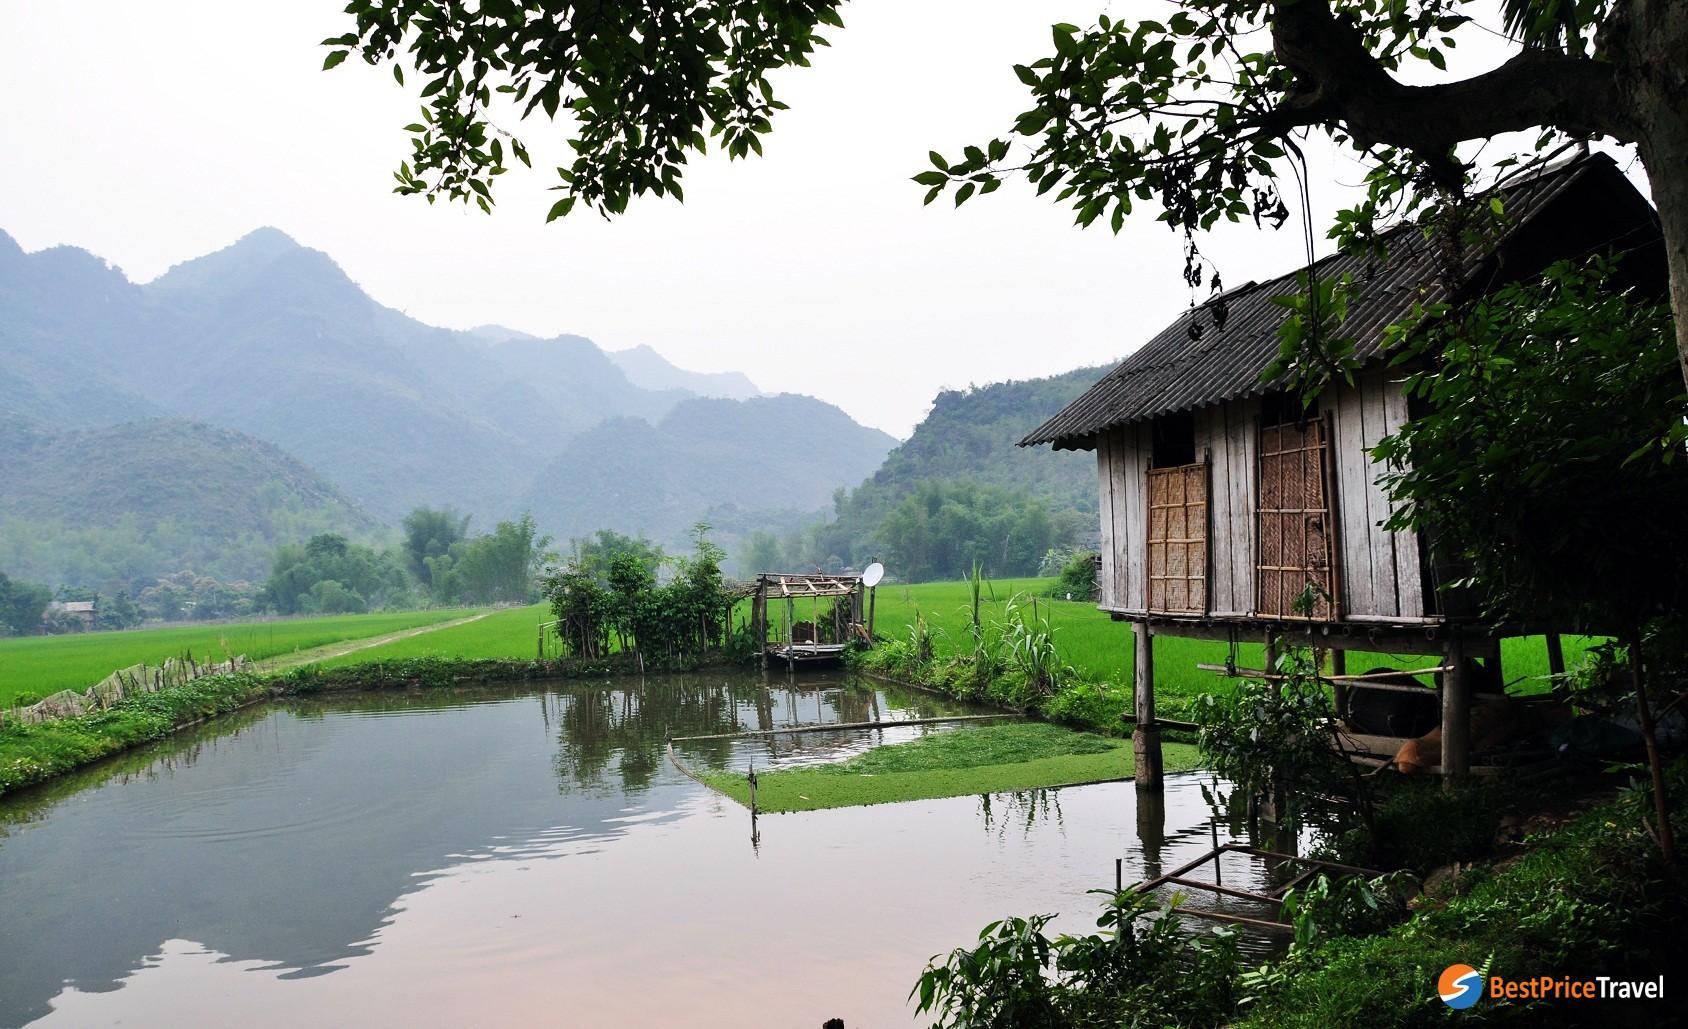 Pom Coong Village - rustic village in northern vietnam